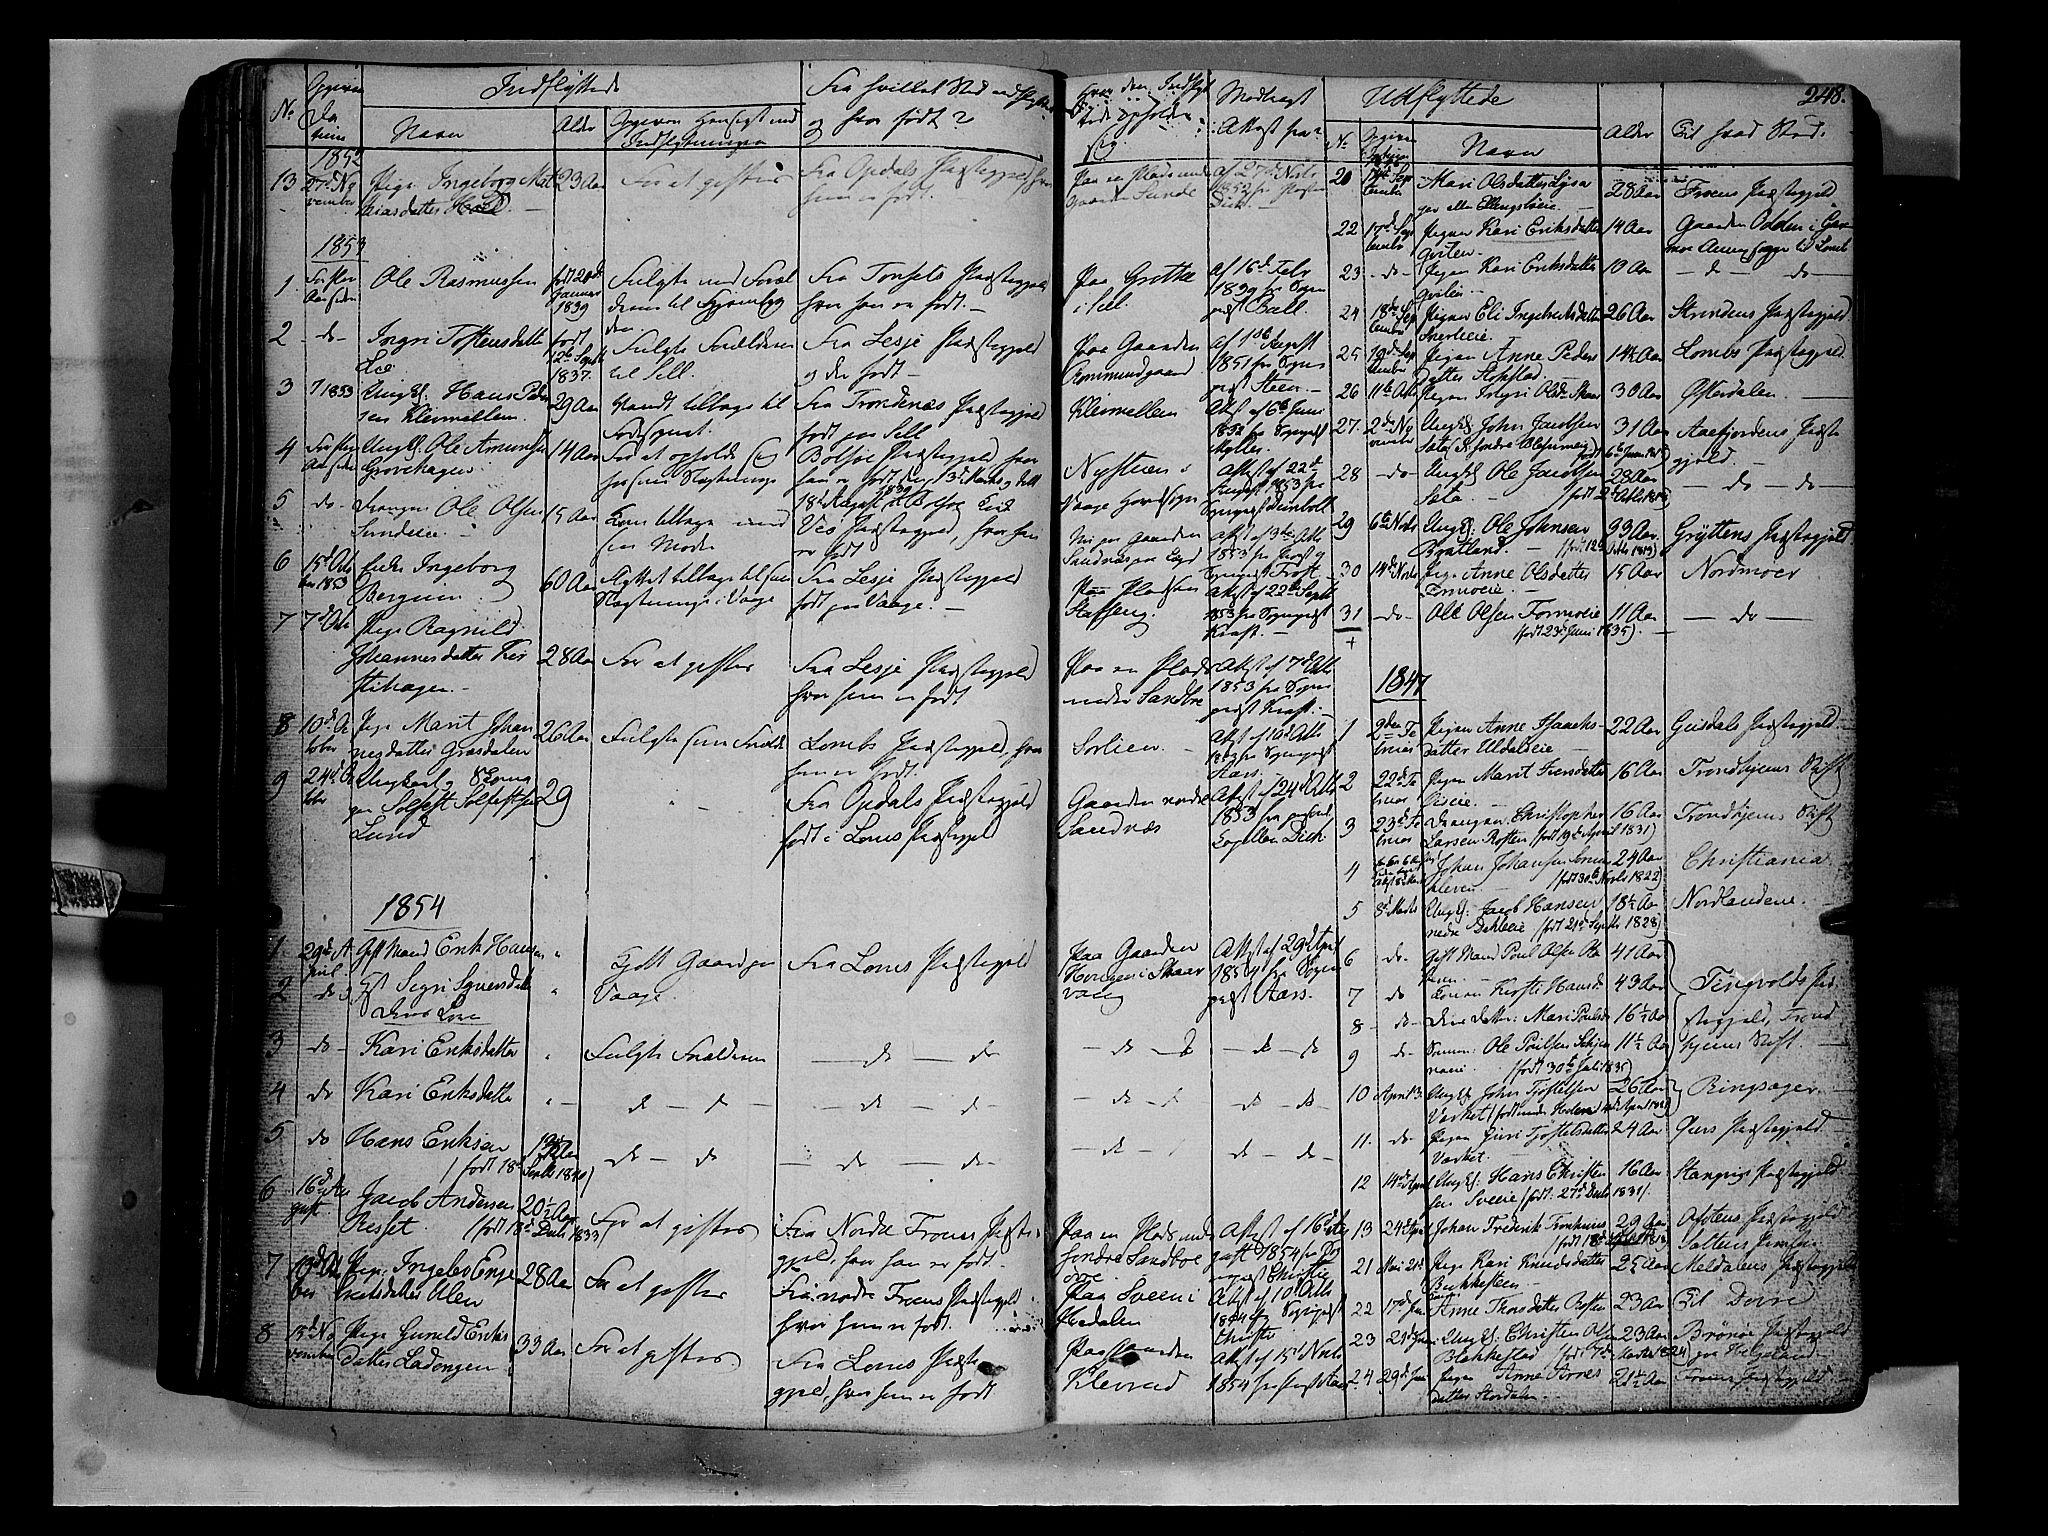 SAH, Vågå prestekontor, Ministerialbok nr. 5 /1, 1842-1856, s. 248